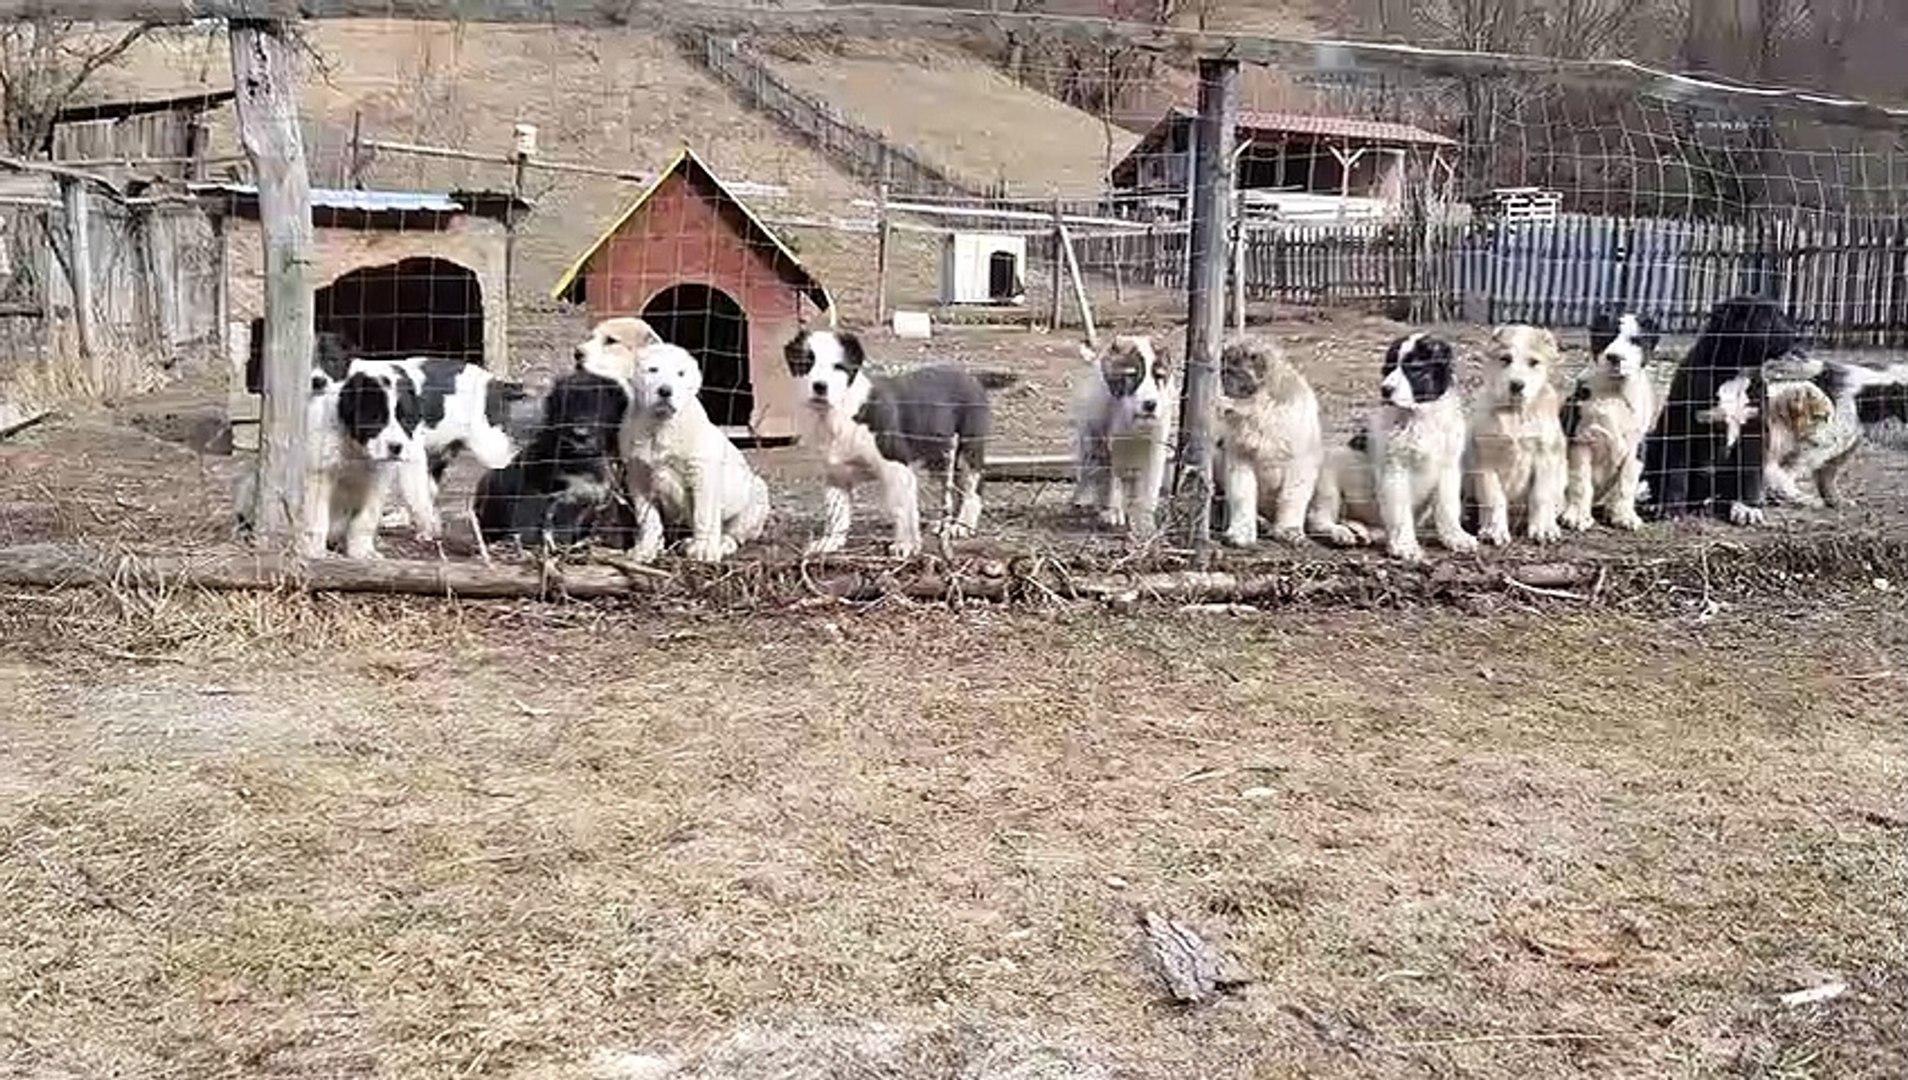 BiR DUZiNE ALABAY COBAN KOPEGi YAVRULARI - ALABAi SHEPHERD DOG PUPPiES FARM